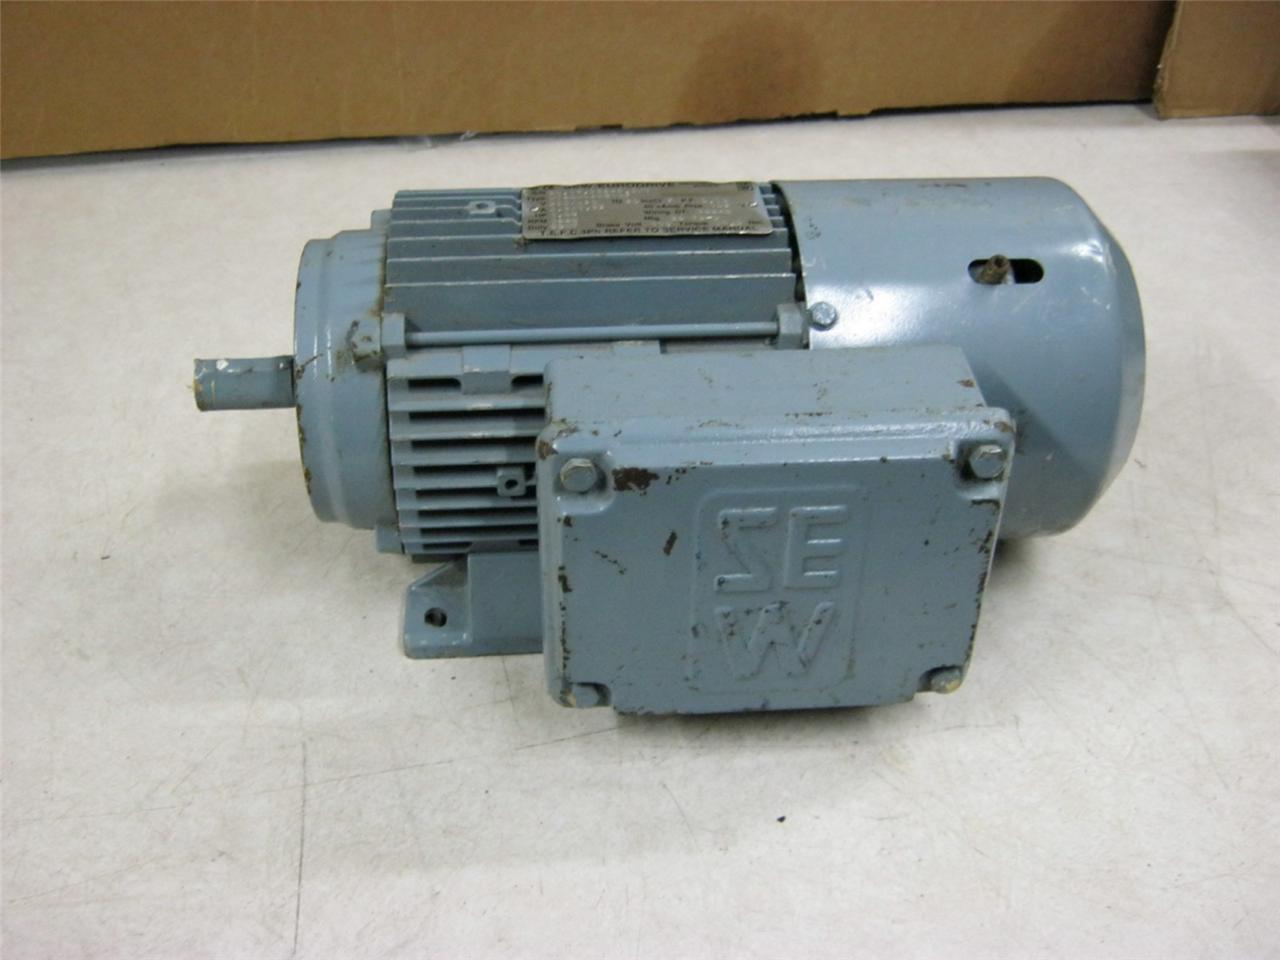 Sew eurodrive motor dt80n4bmg1hf 1hp 1680 rpm 3 ph ebay for Sew motors and drives